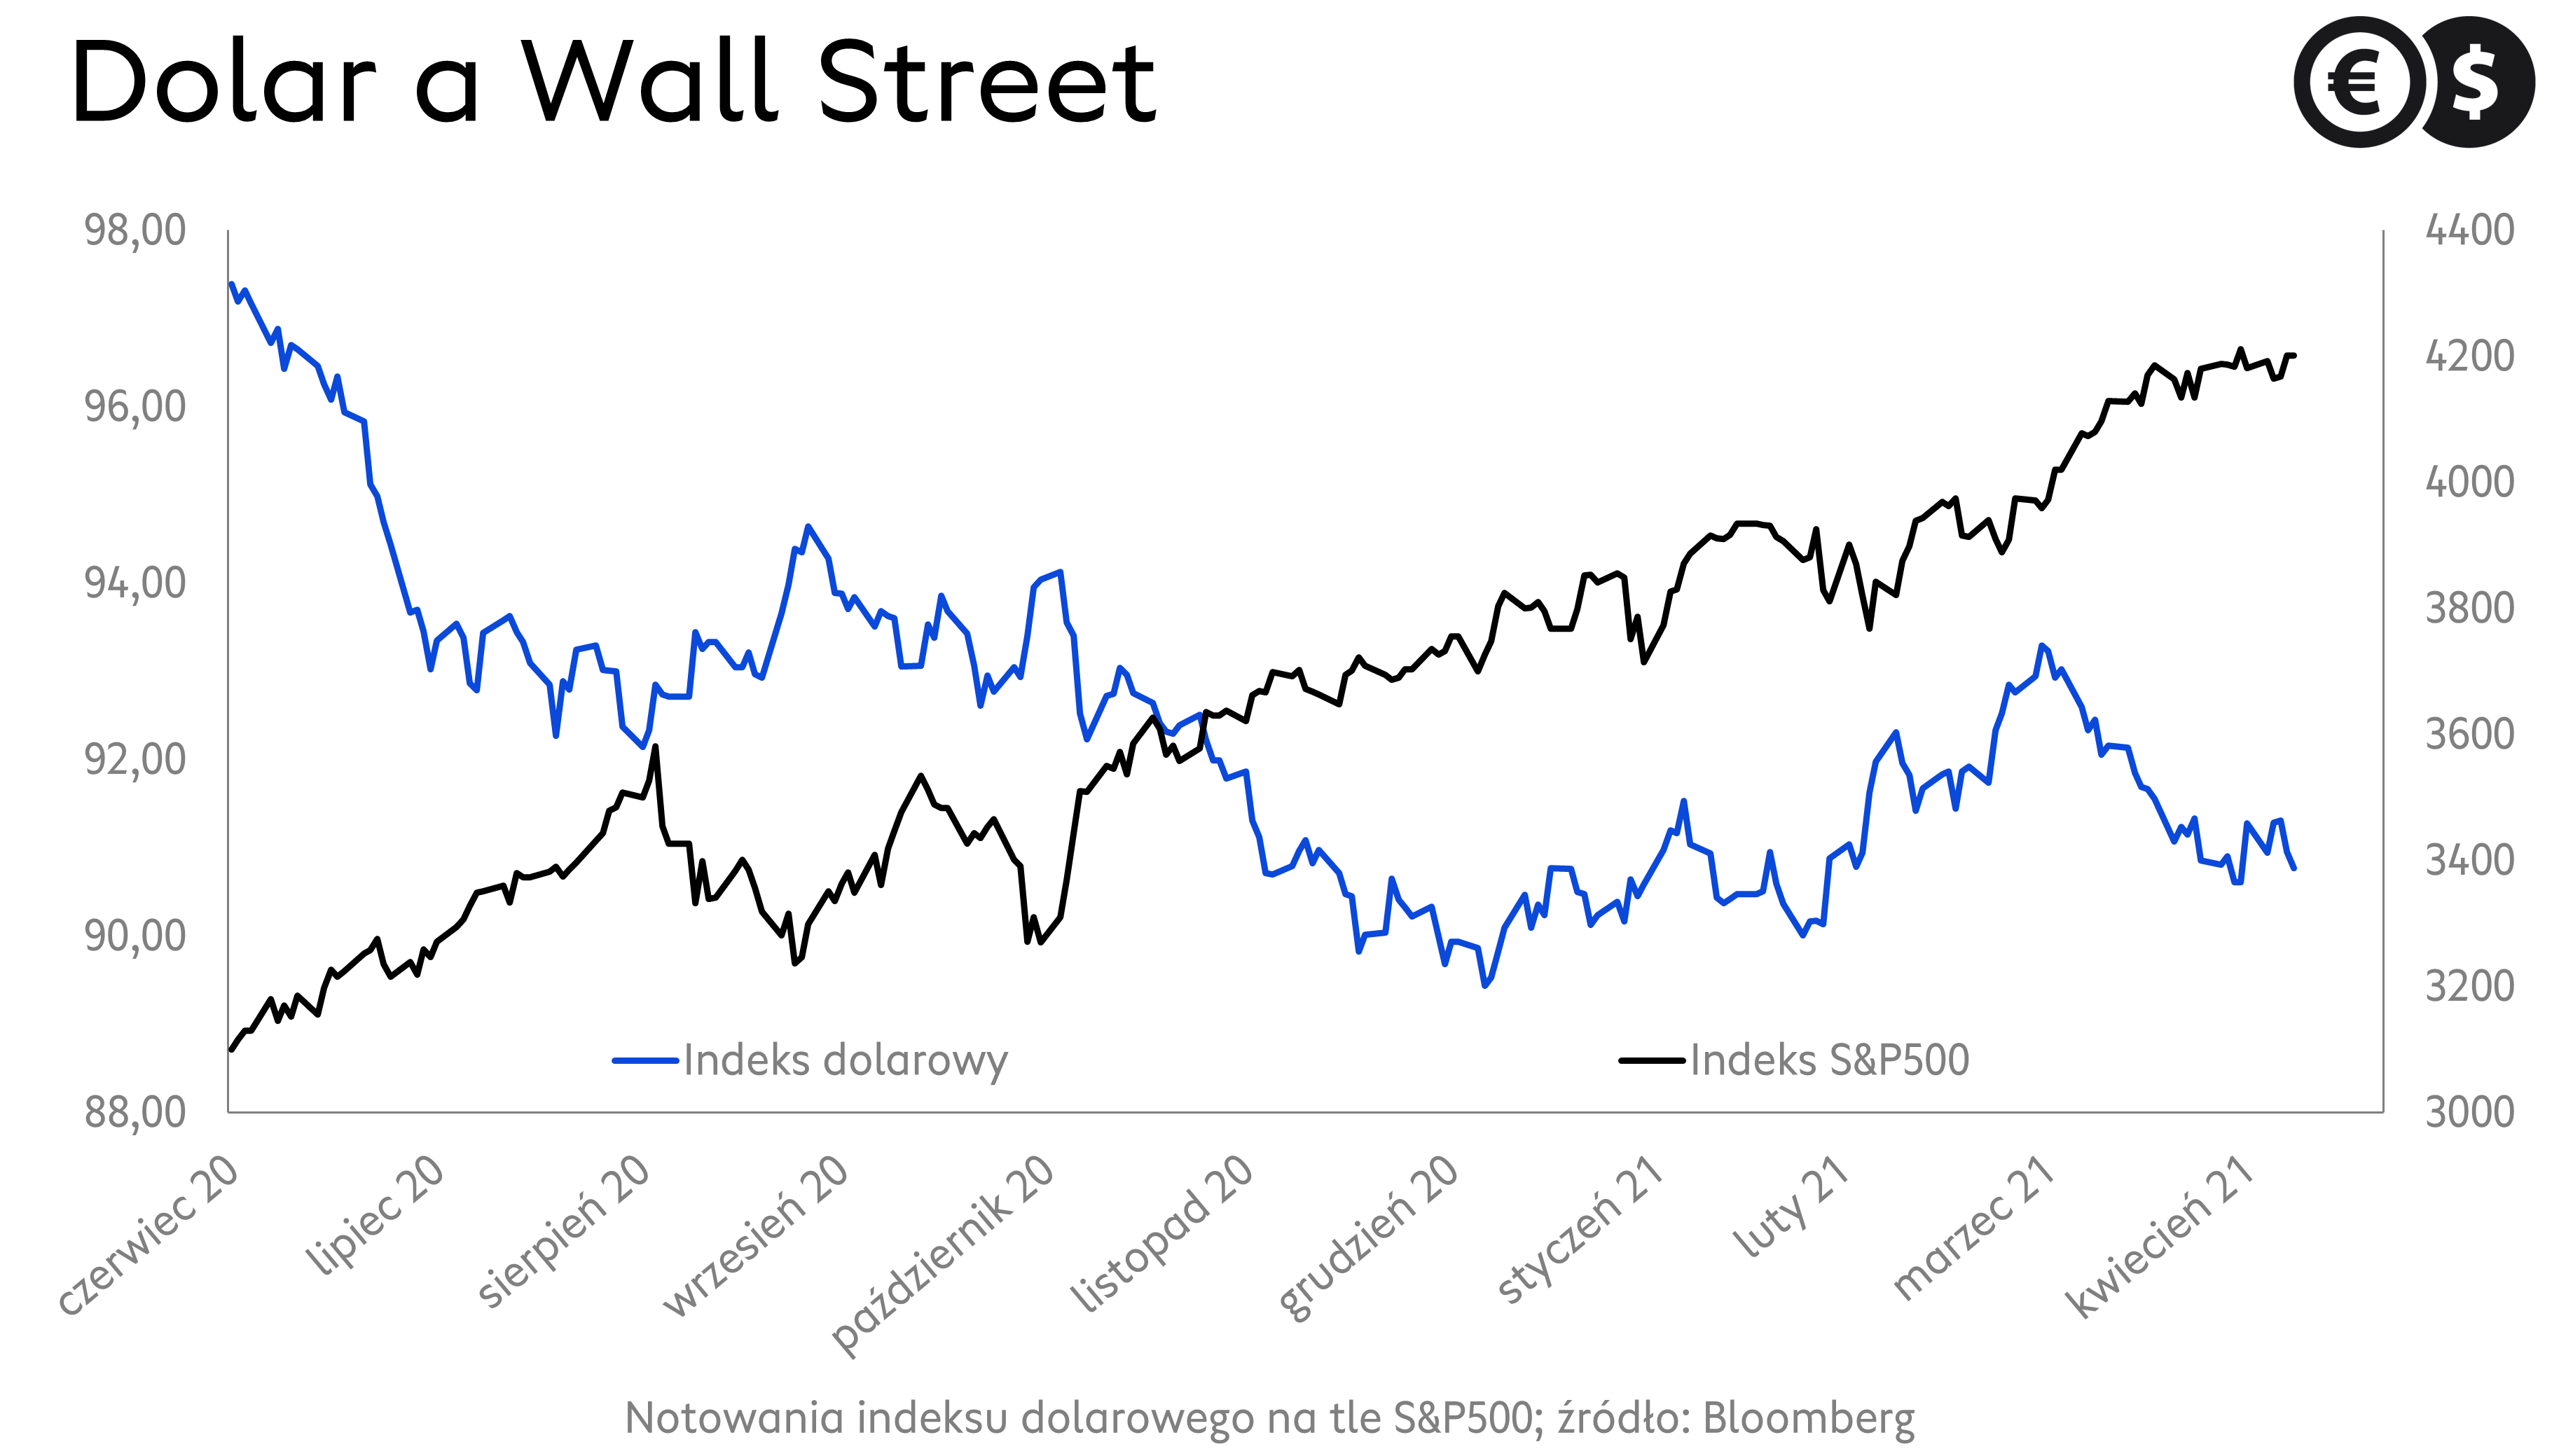 Kurs dolara a notowania S&P500; źródło: Bloomberg